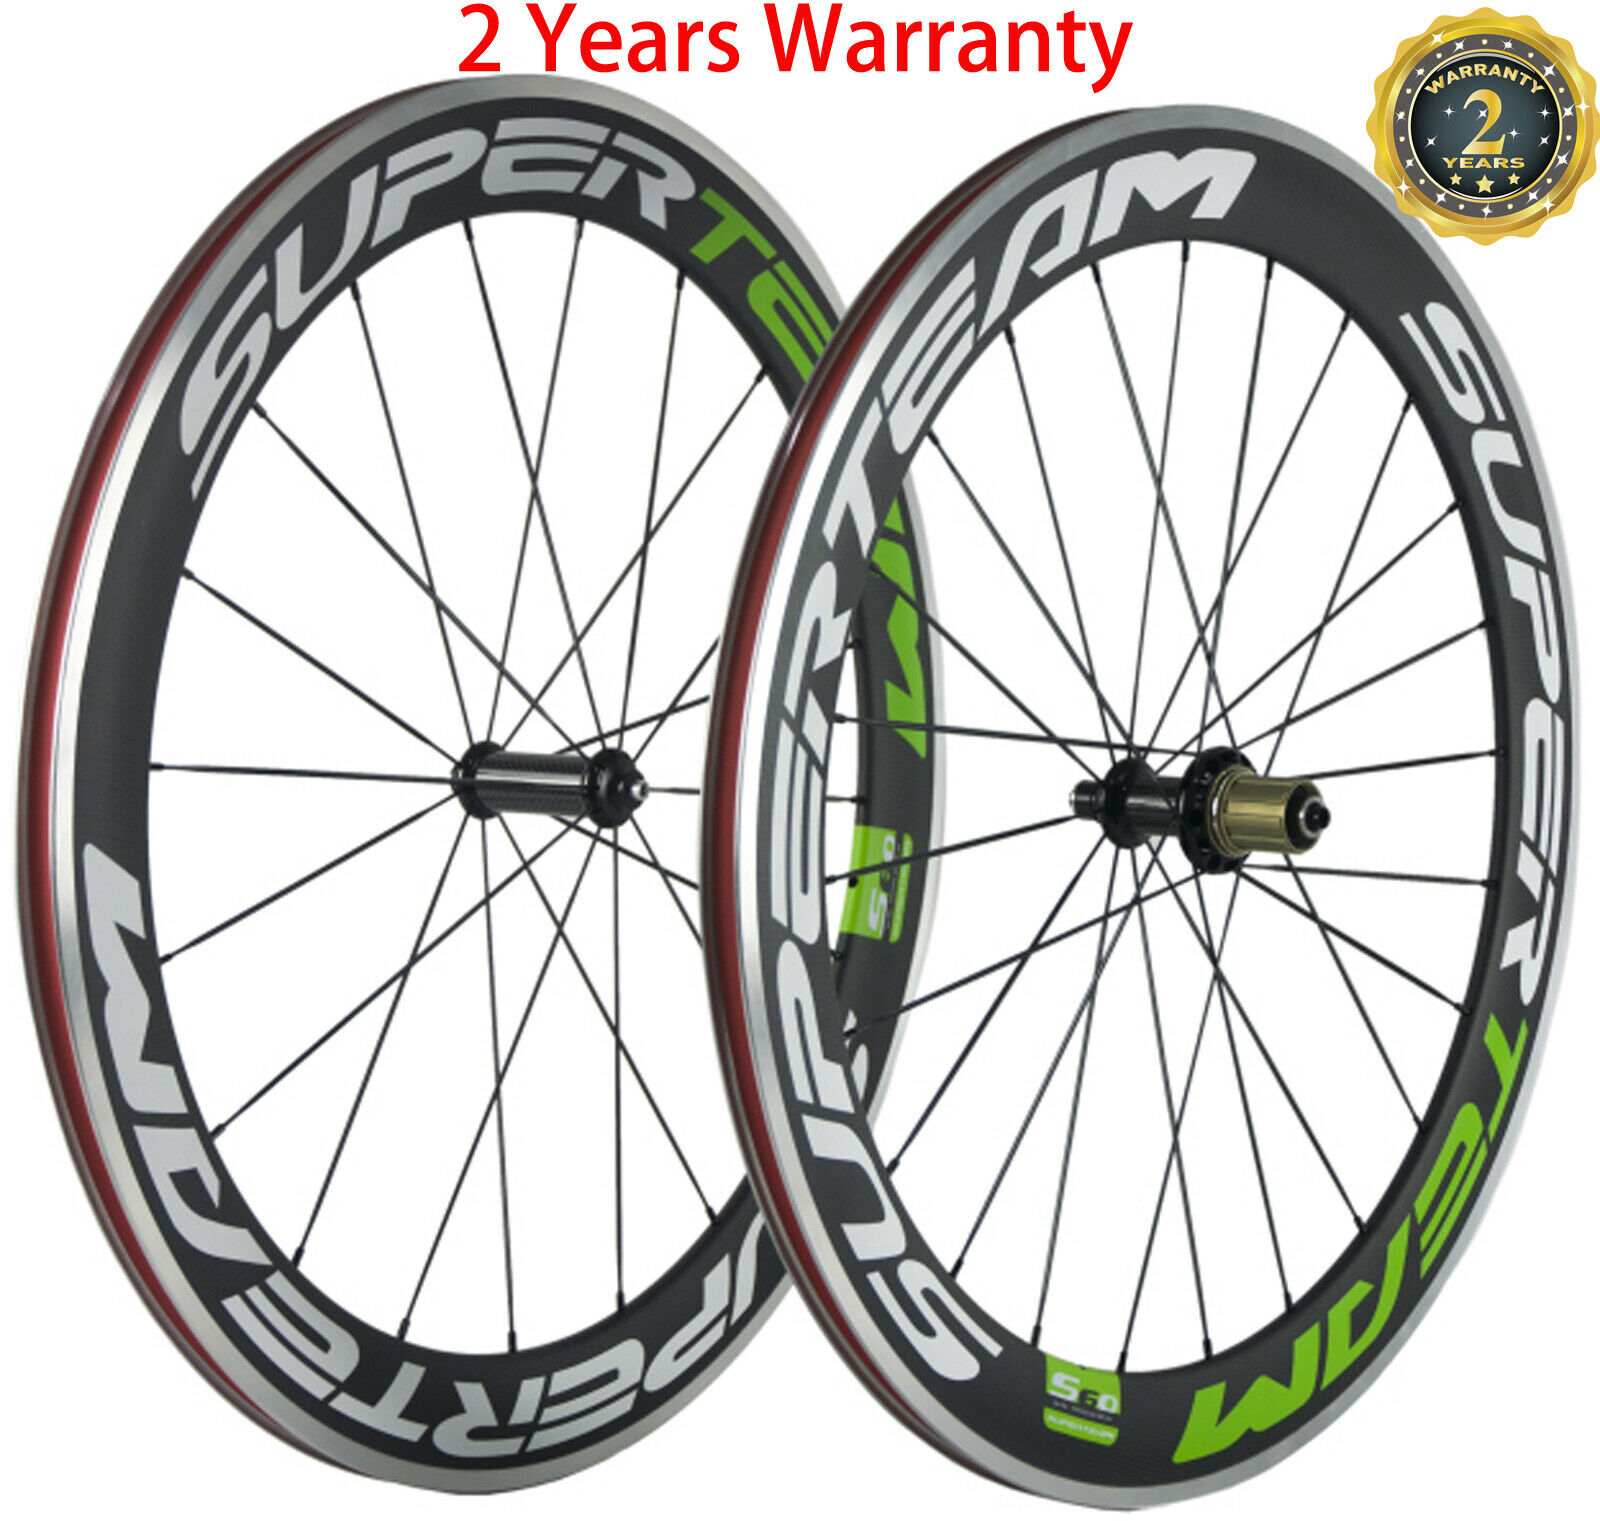 Aluminum Brake Surface Carbon Wheels  38 50 60 88mm Carbon Wheelset Powerway R36  outlet online store